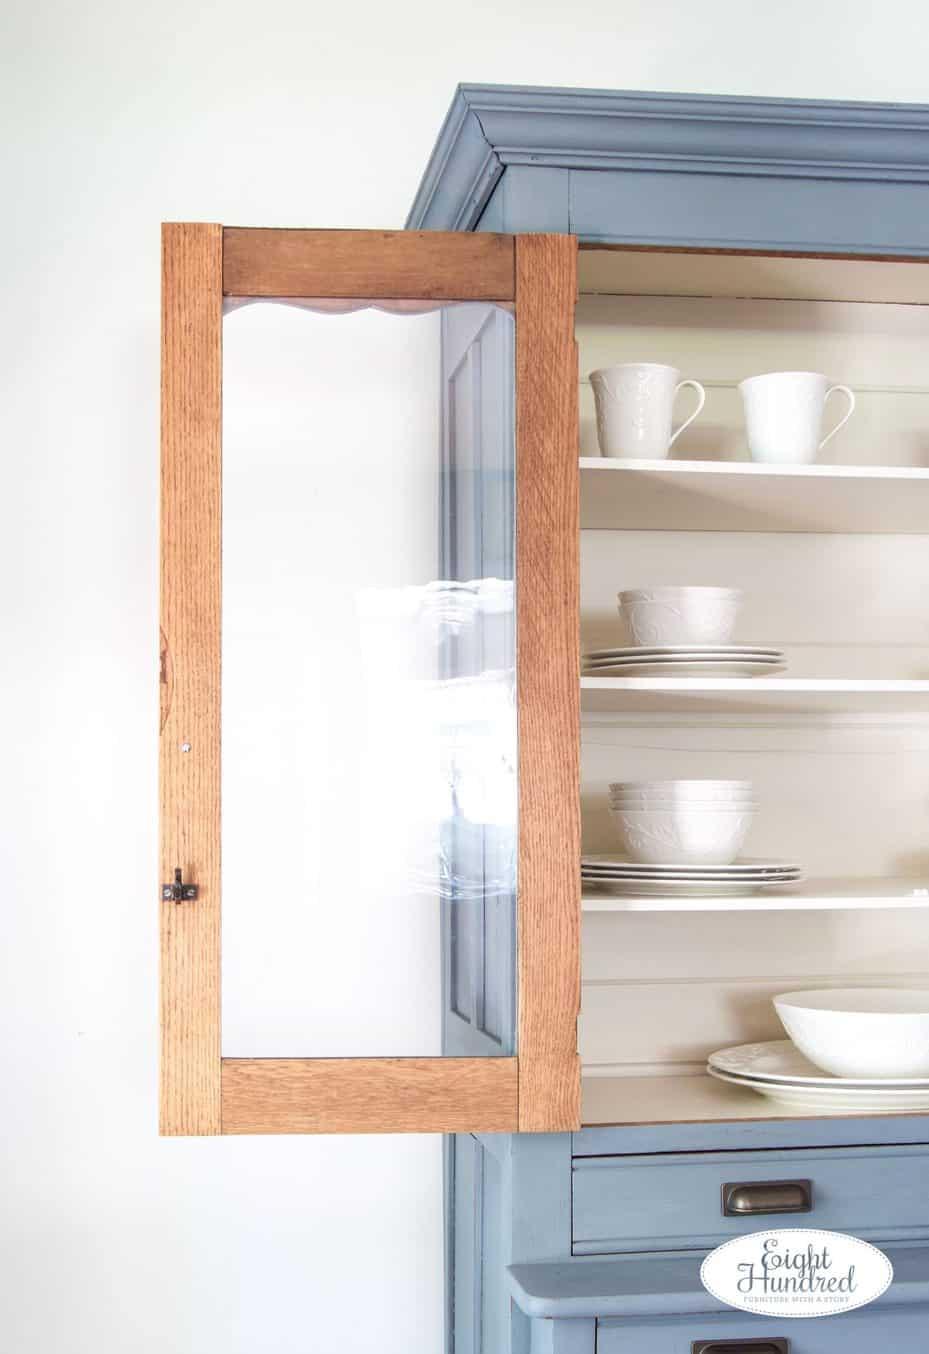 Wavy glass in aviary hutch, door of hutch